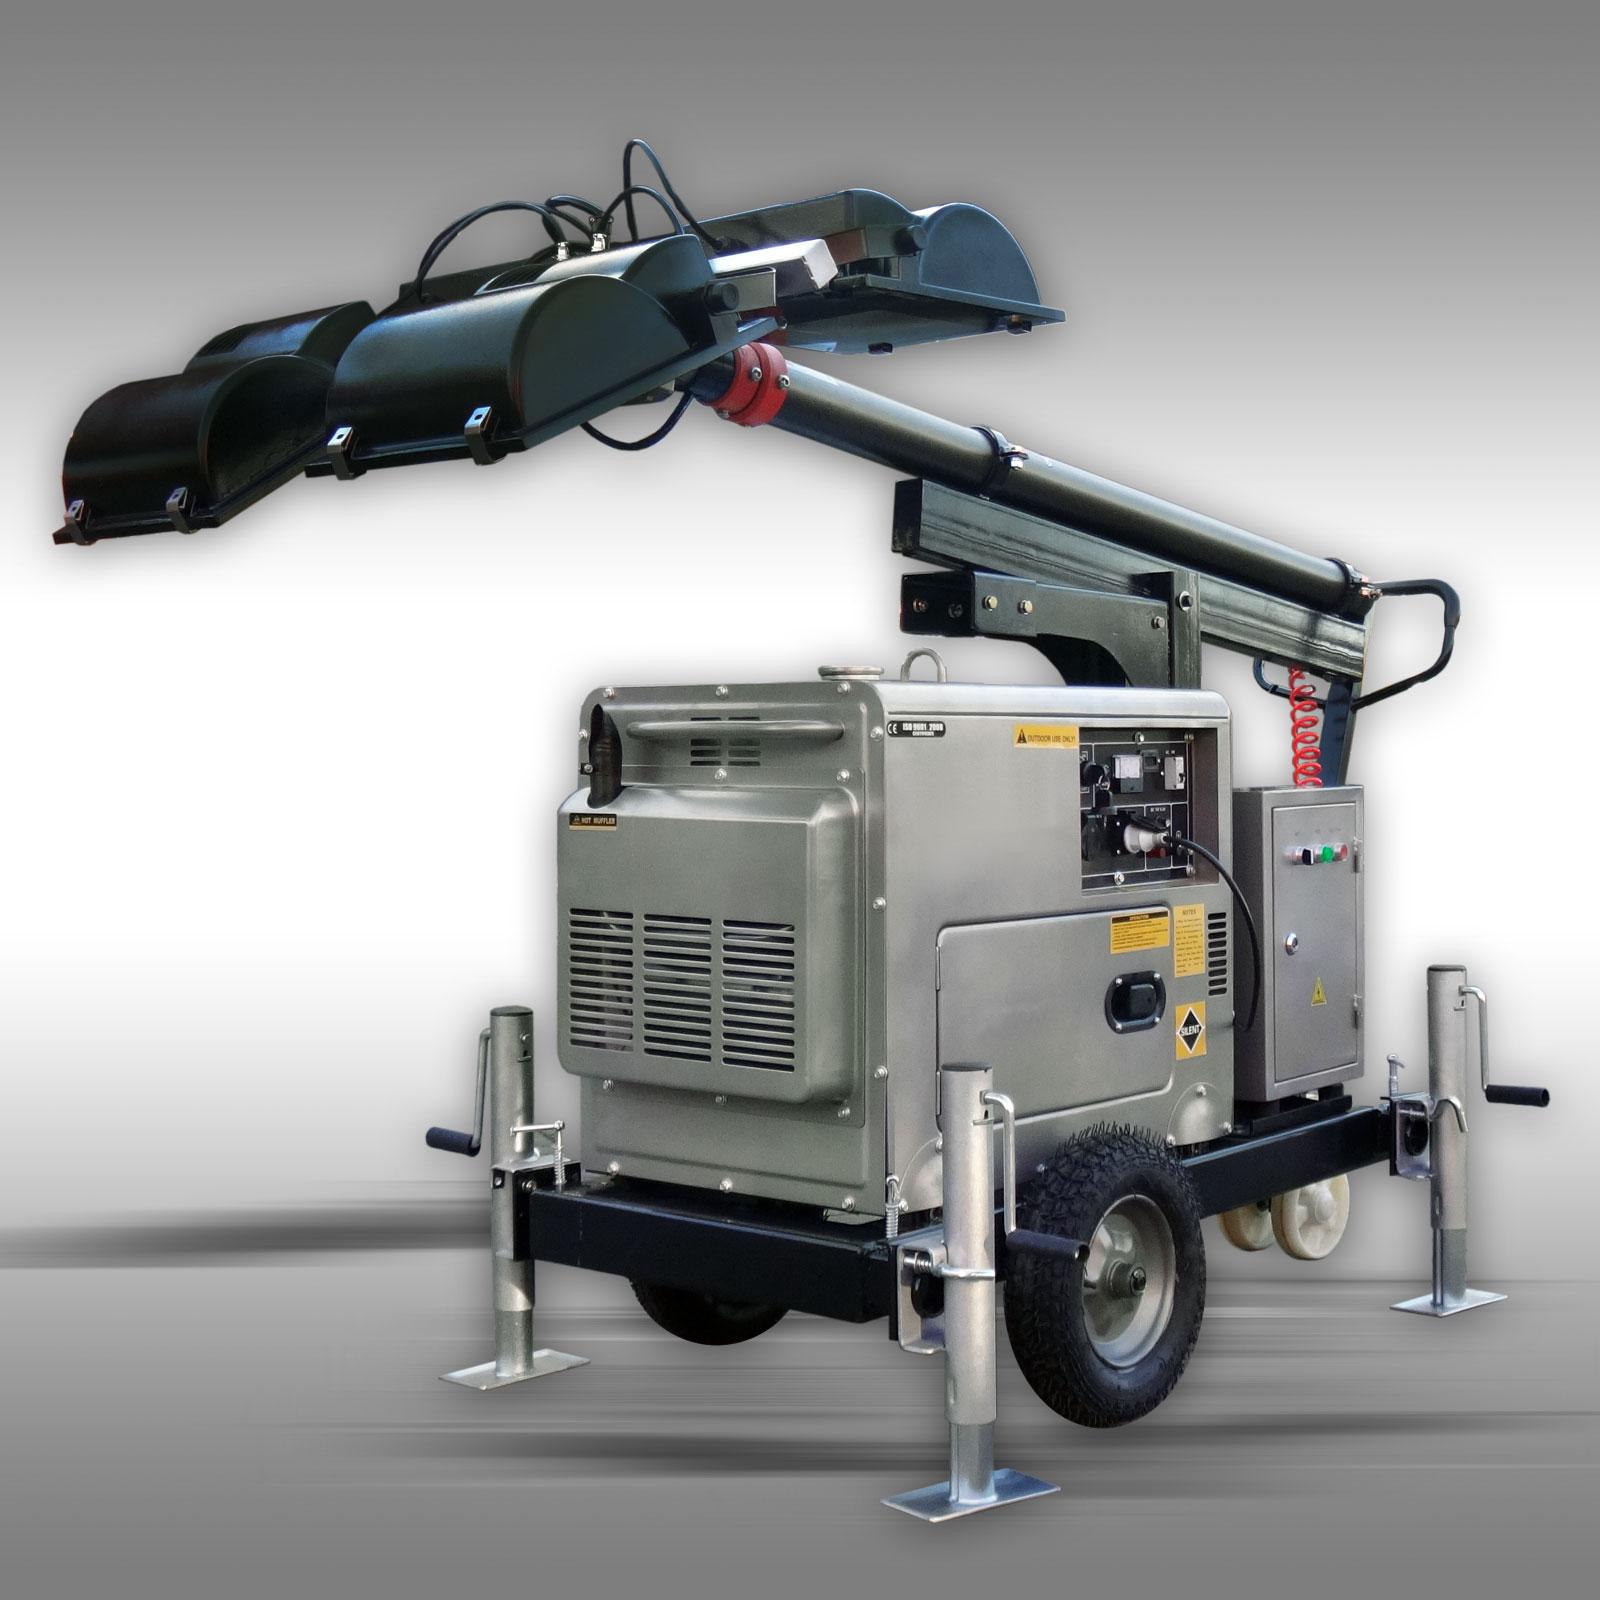 diesel stromgenerator 5 kw lichtmast flutlicht stromaggregat stromerzeuger. Black Bedroom Furniture Sets. Home Design Ideas